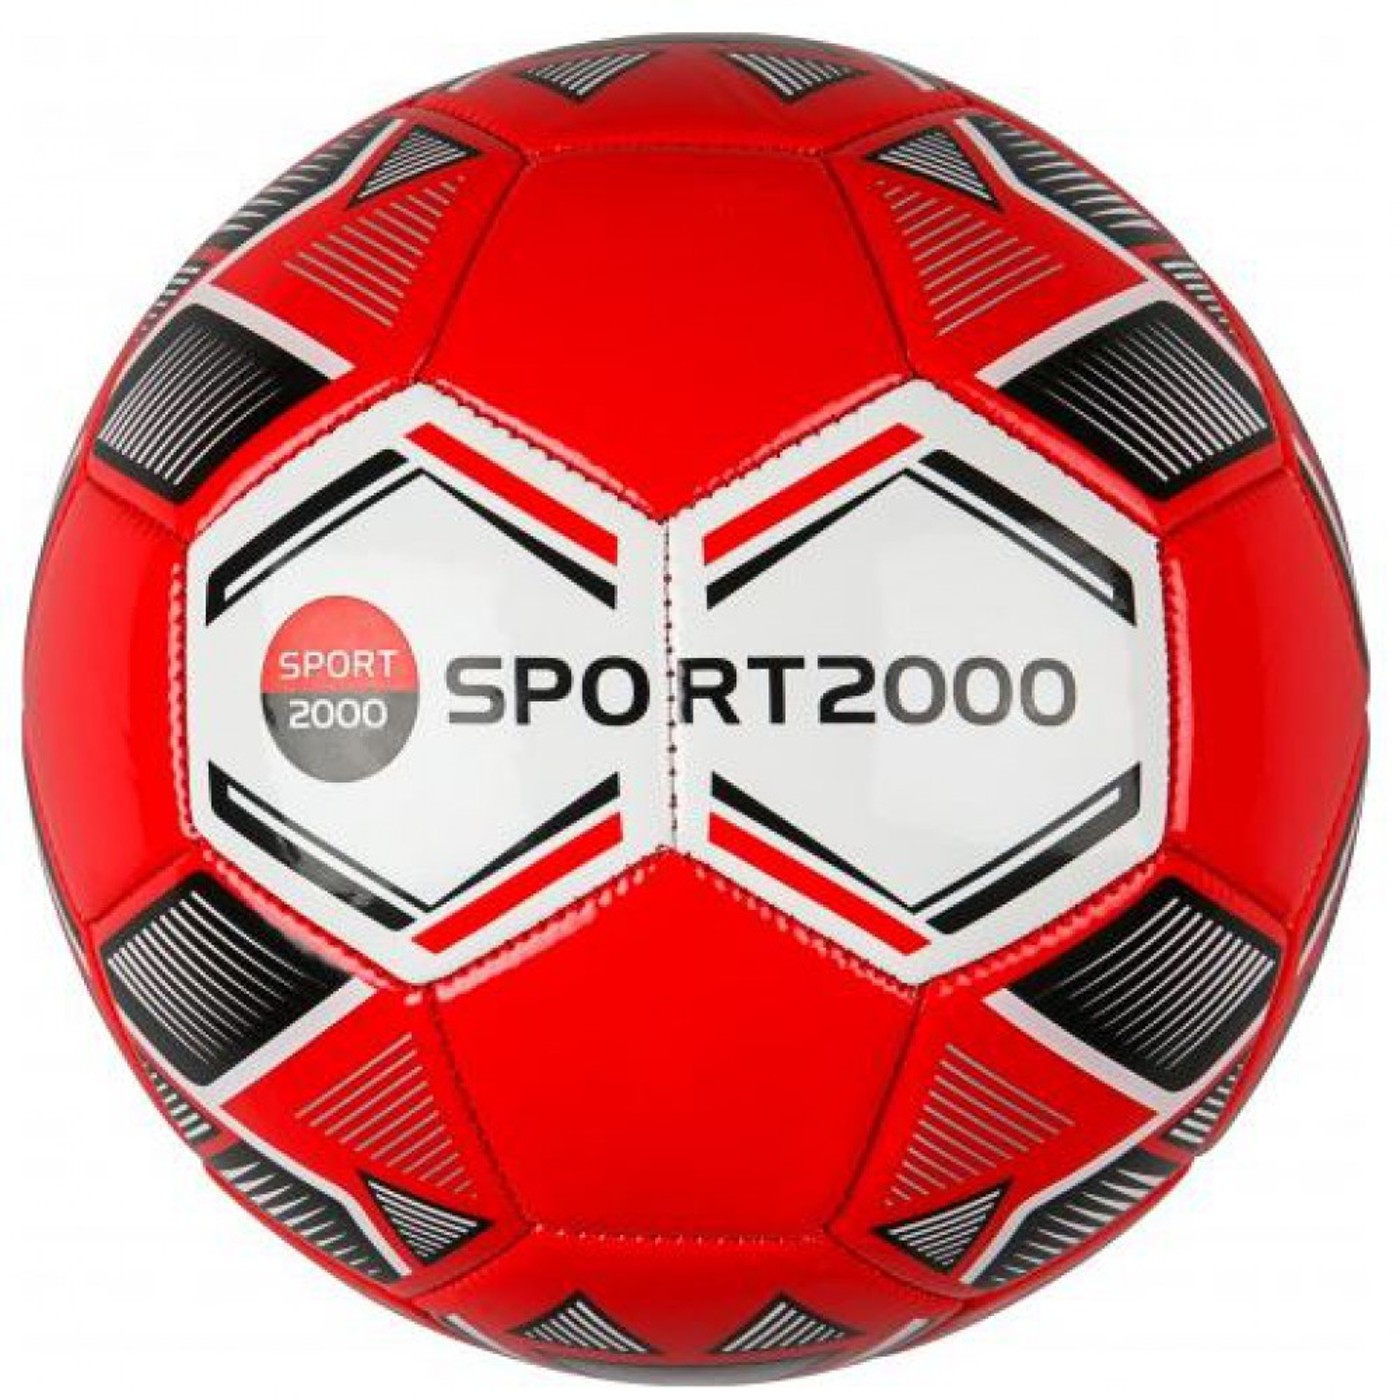 SPORT 2000 PROMO MINI